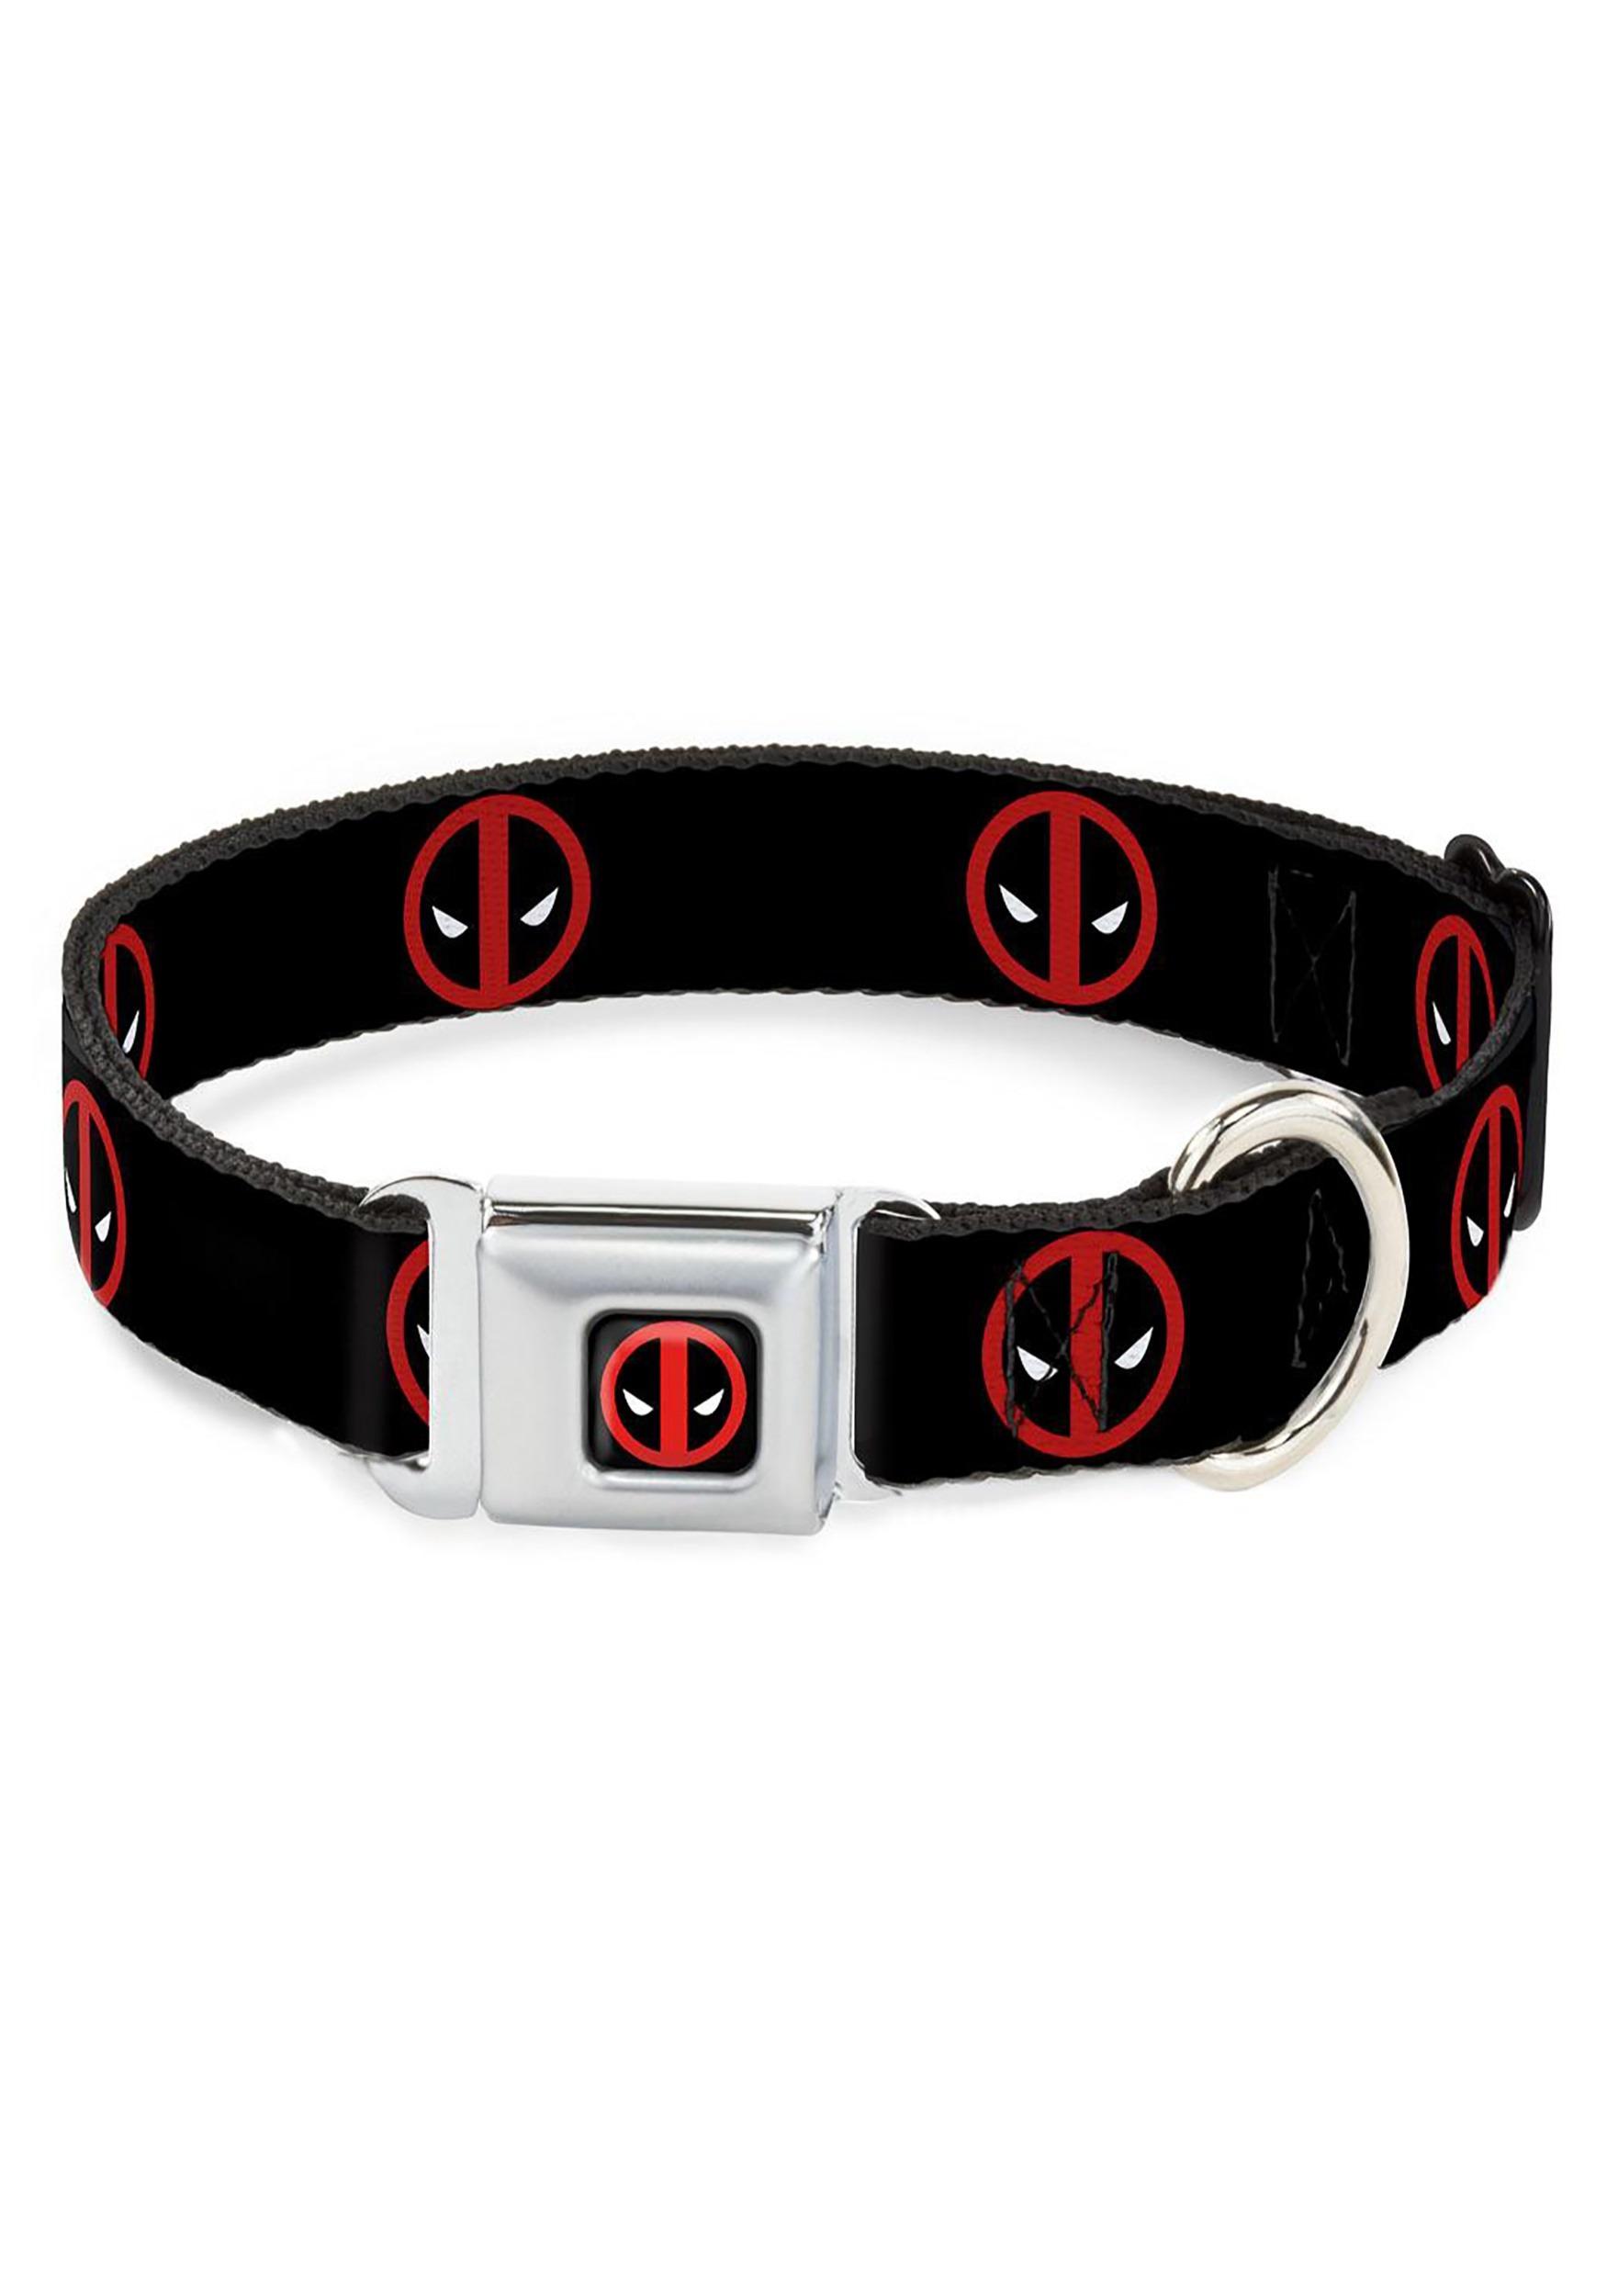 Marvel_Logo_Deadpool_Black_Seatbelt_Buckle_Dog_Collar_1_Wide